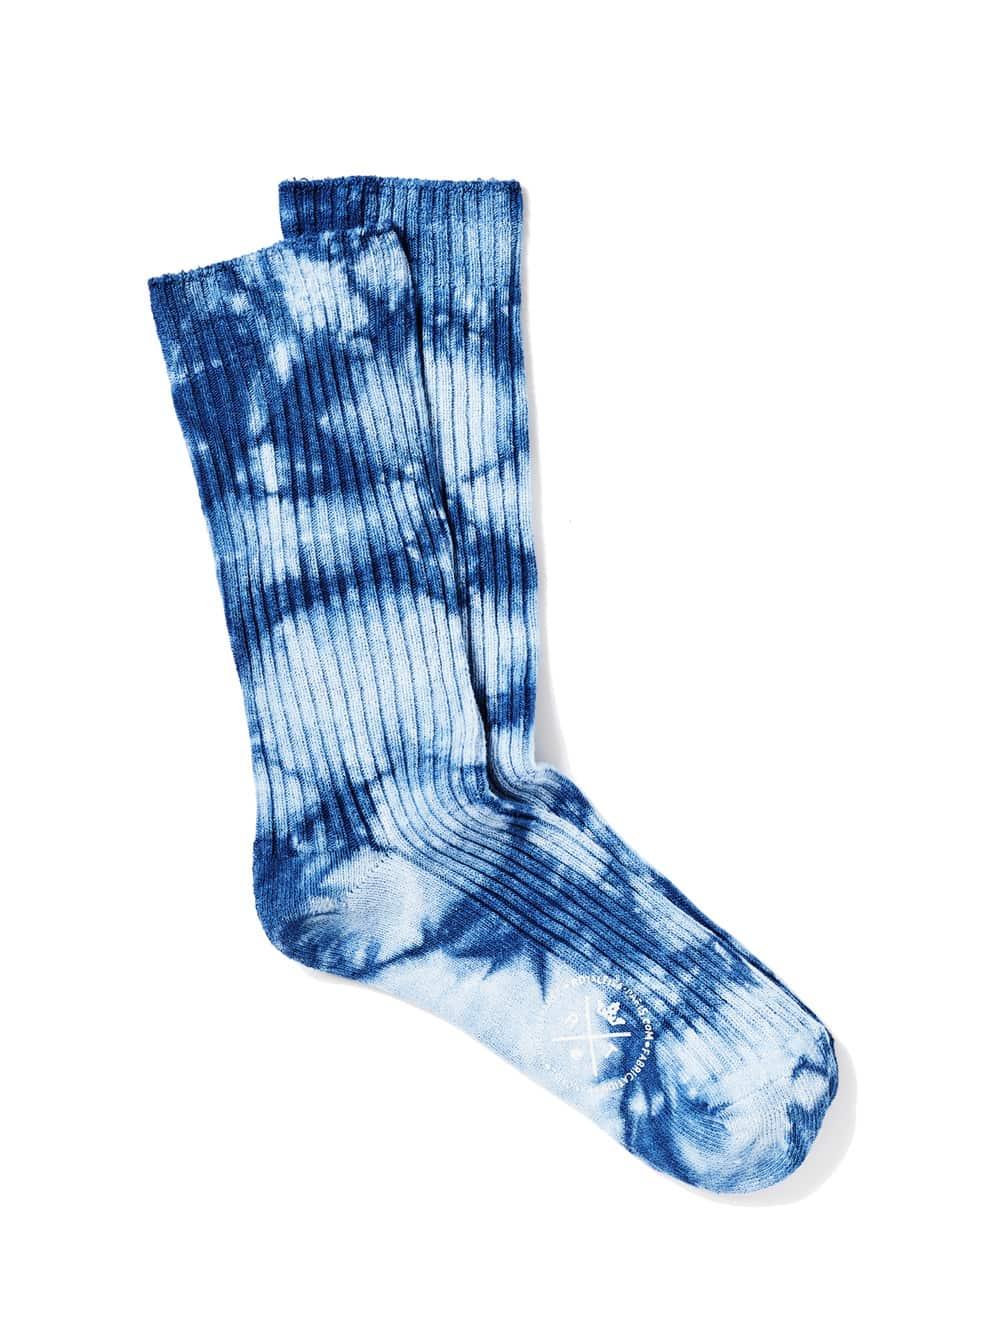 chaussettes-royalties-paris-capsule-teinture-tie-and-dye